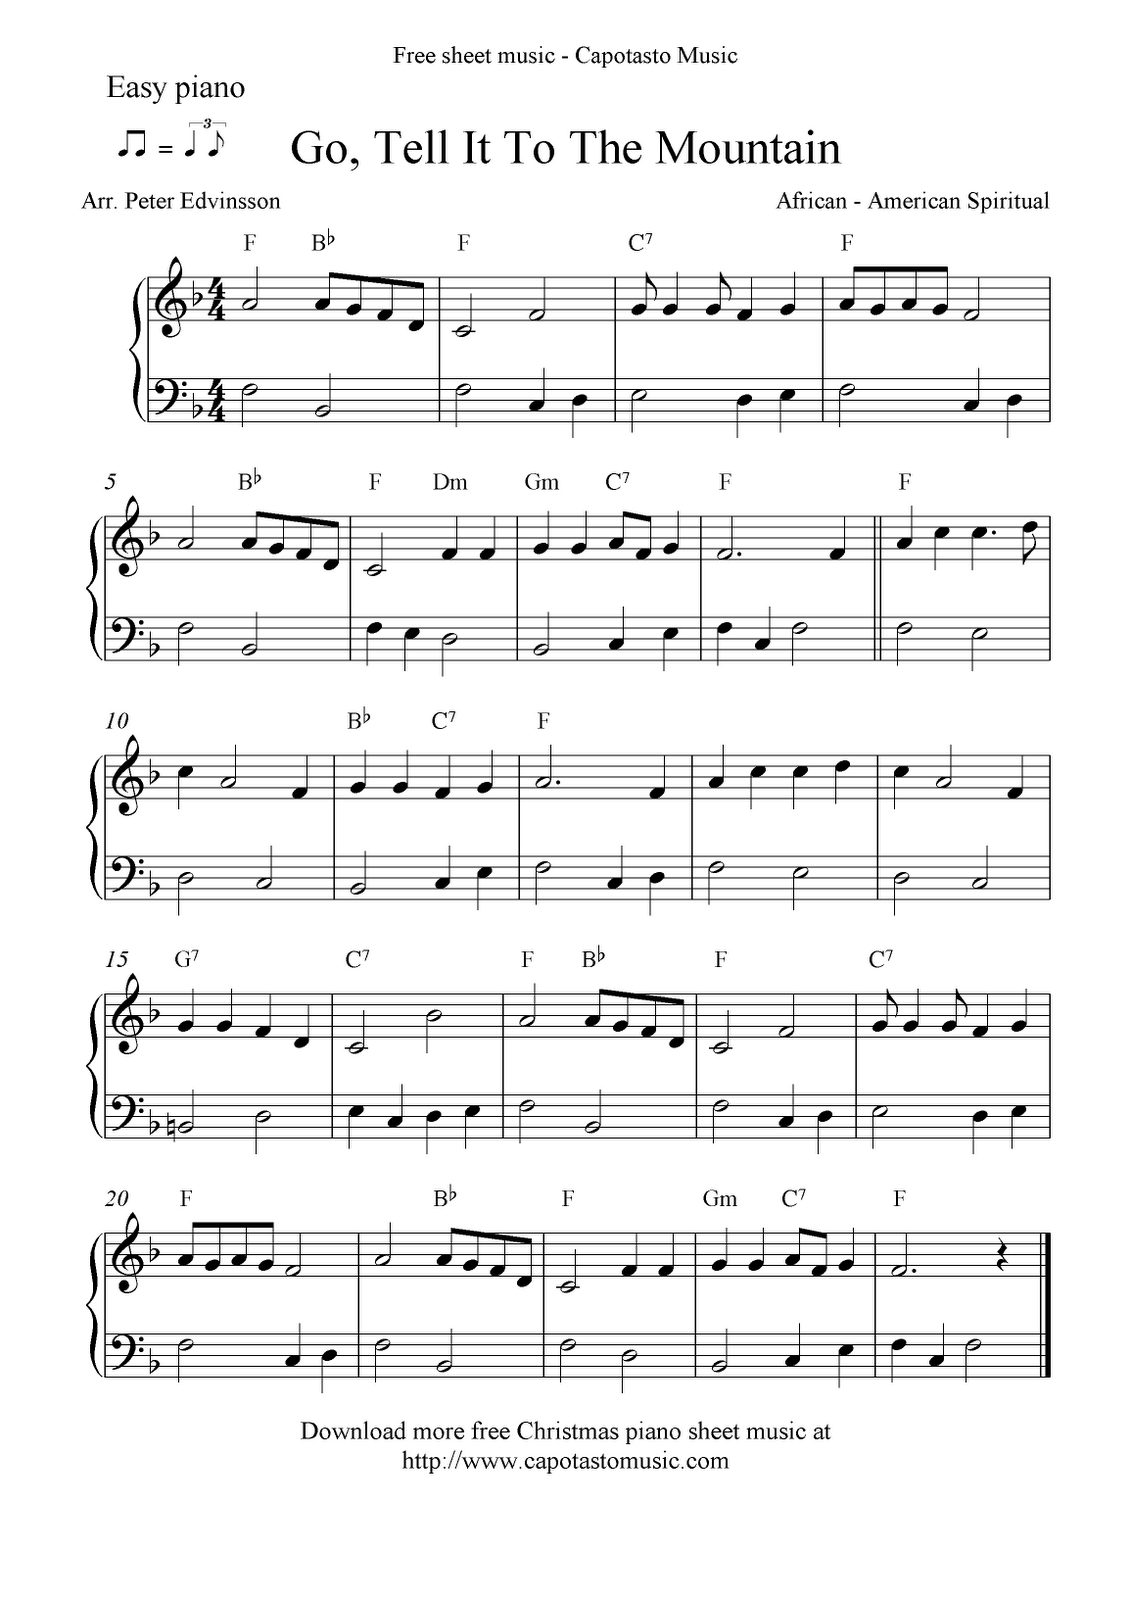 Free Printable Piano Sheet Music   Free Sheet Music Scores: Easy - Christmas Songs Piano Sheet Music Free Printable